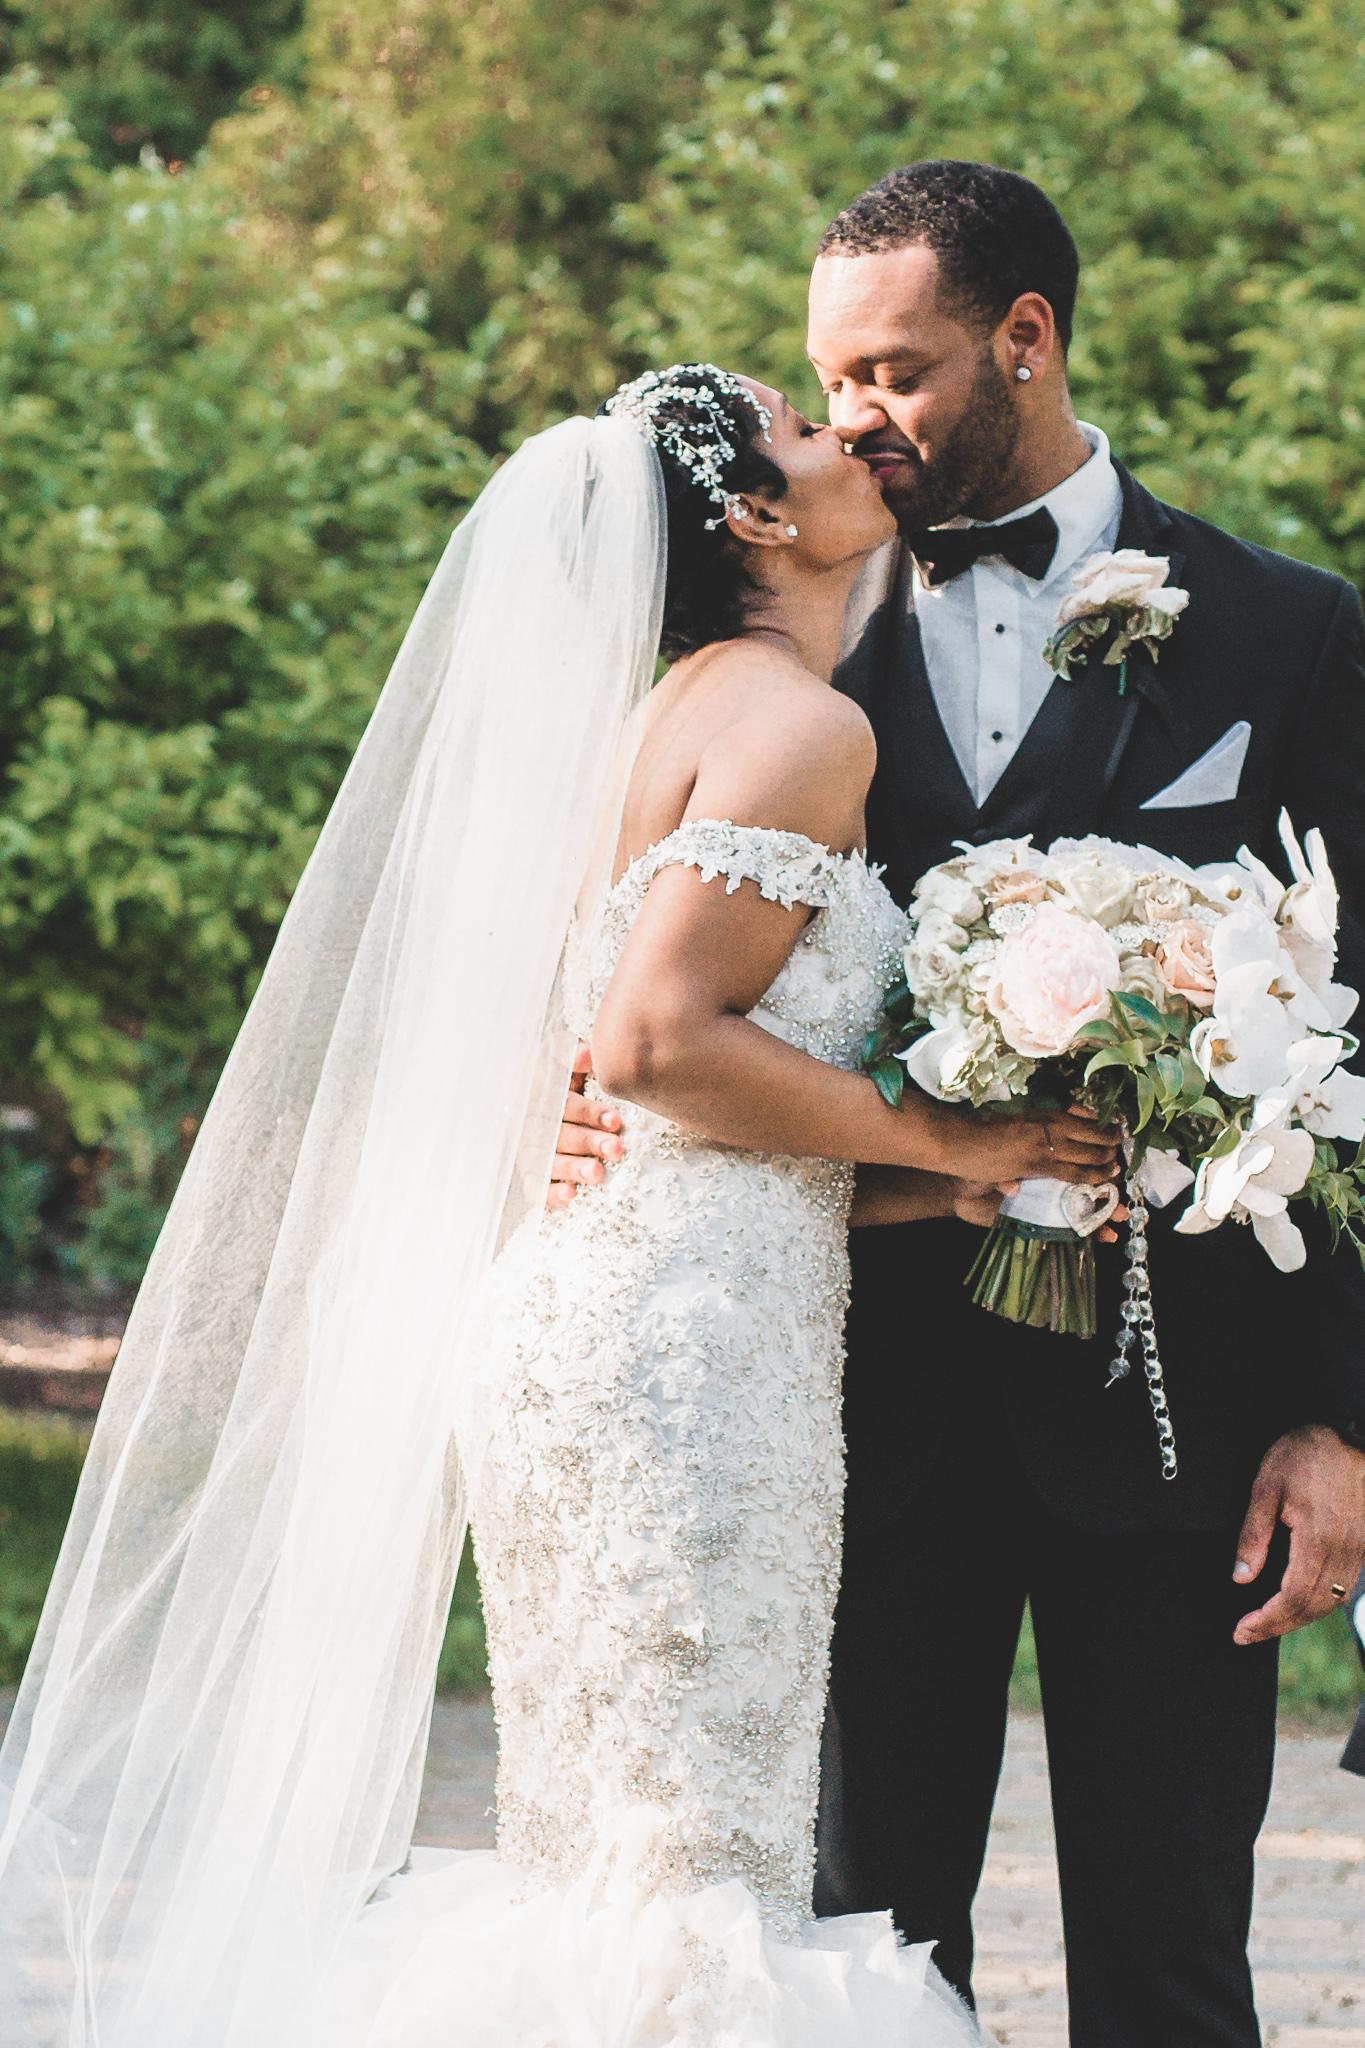 20180527wedding-gant-578.jpg